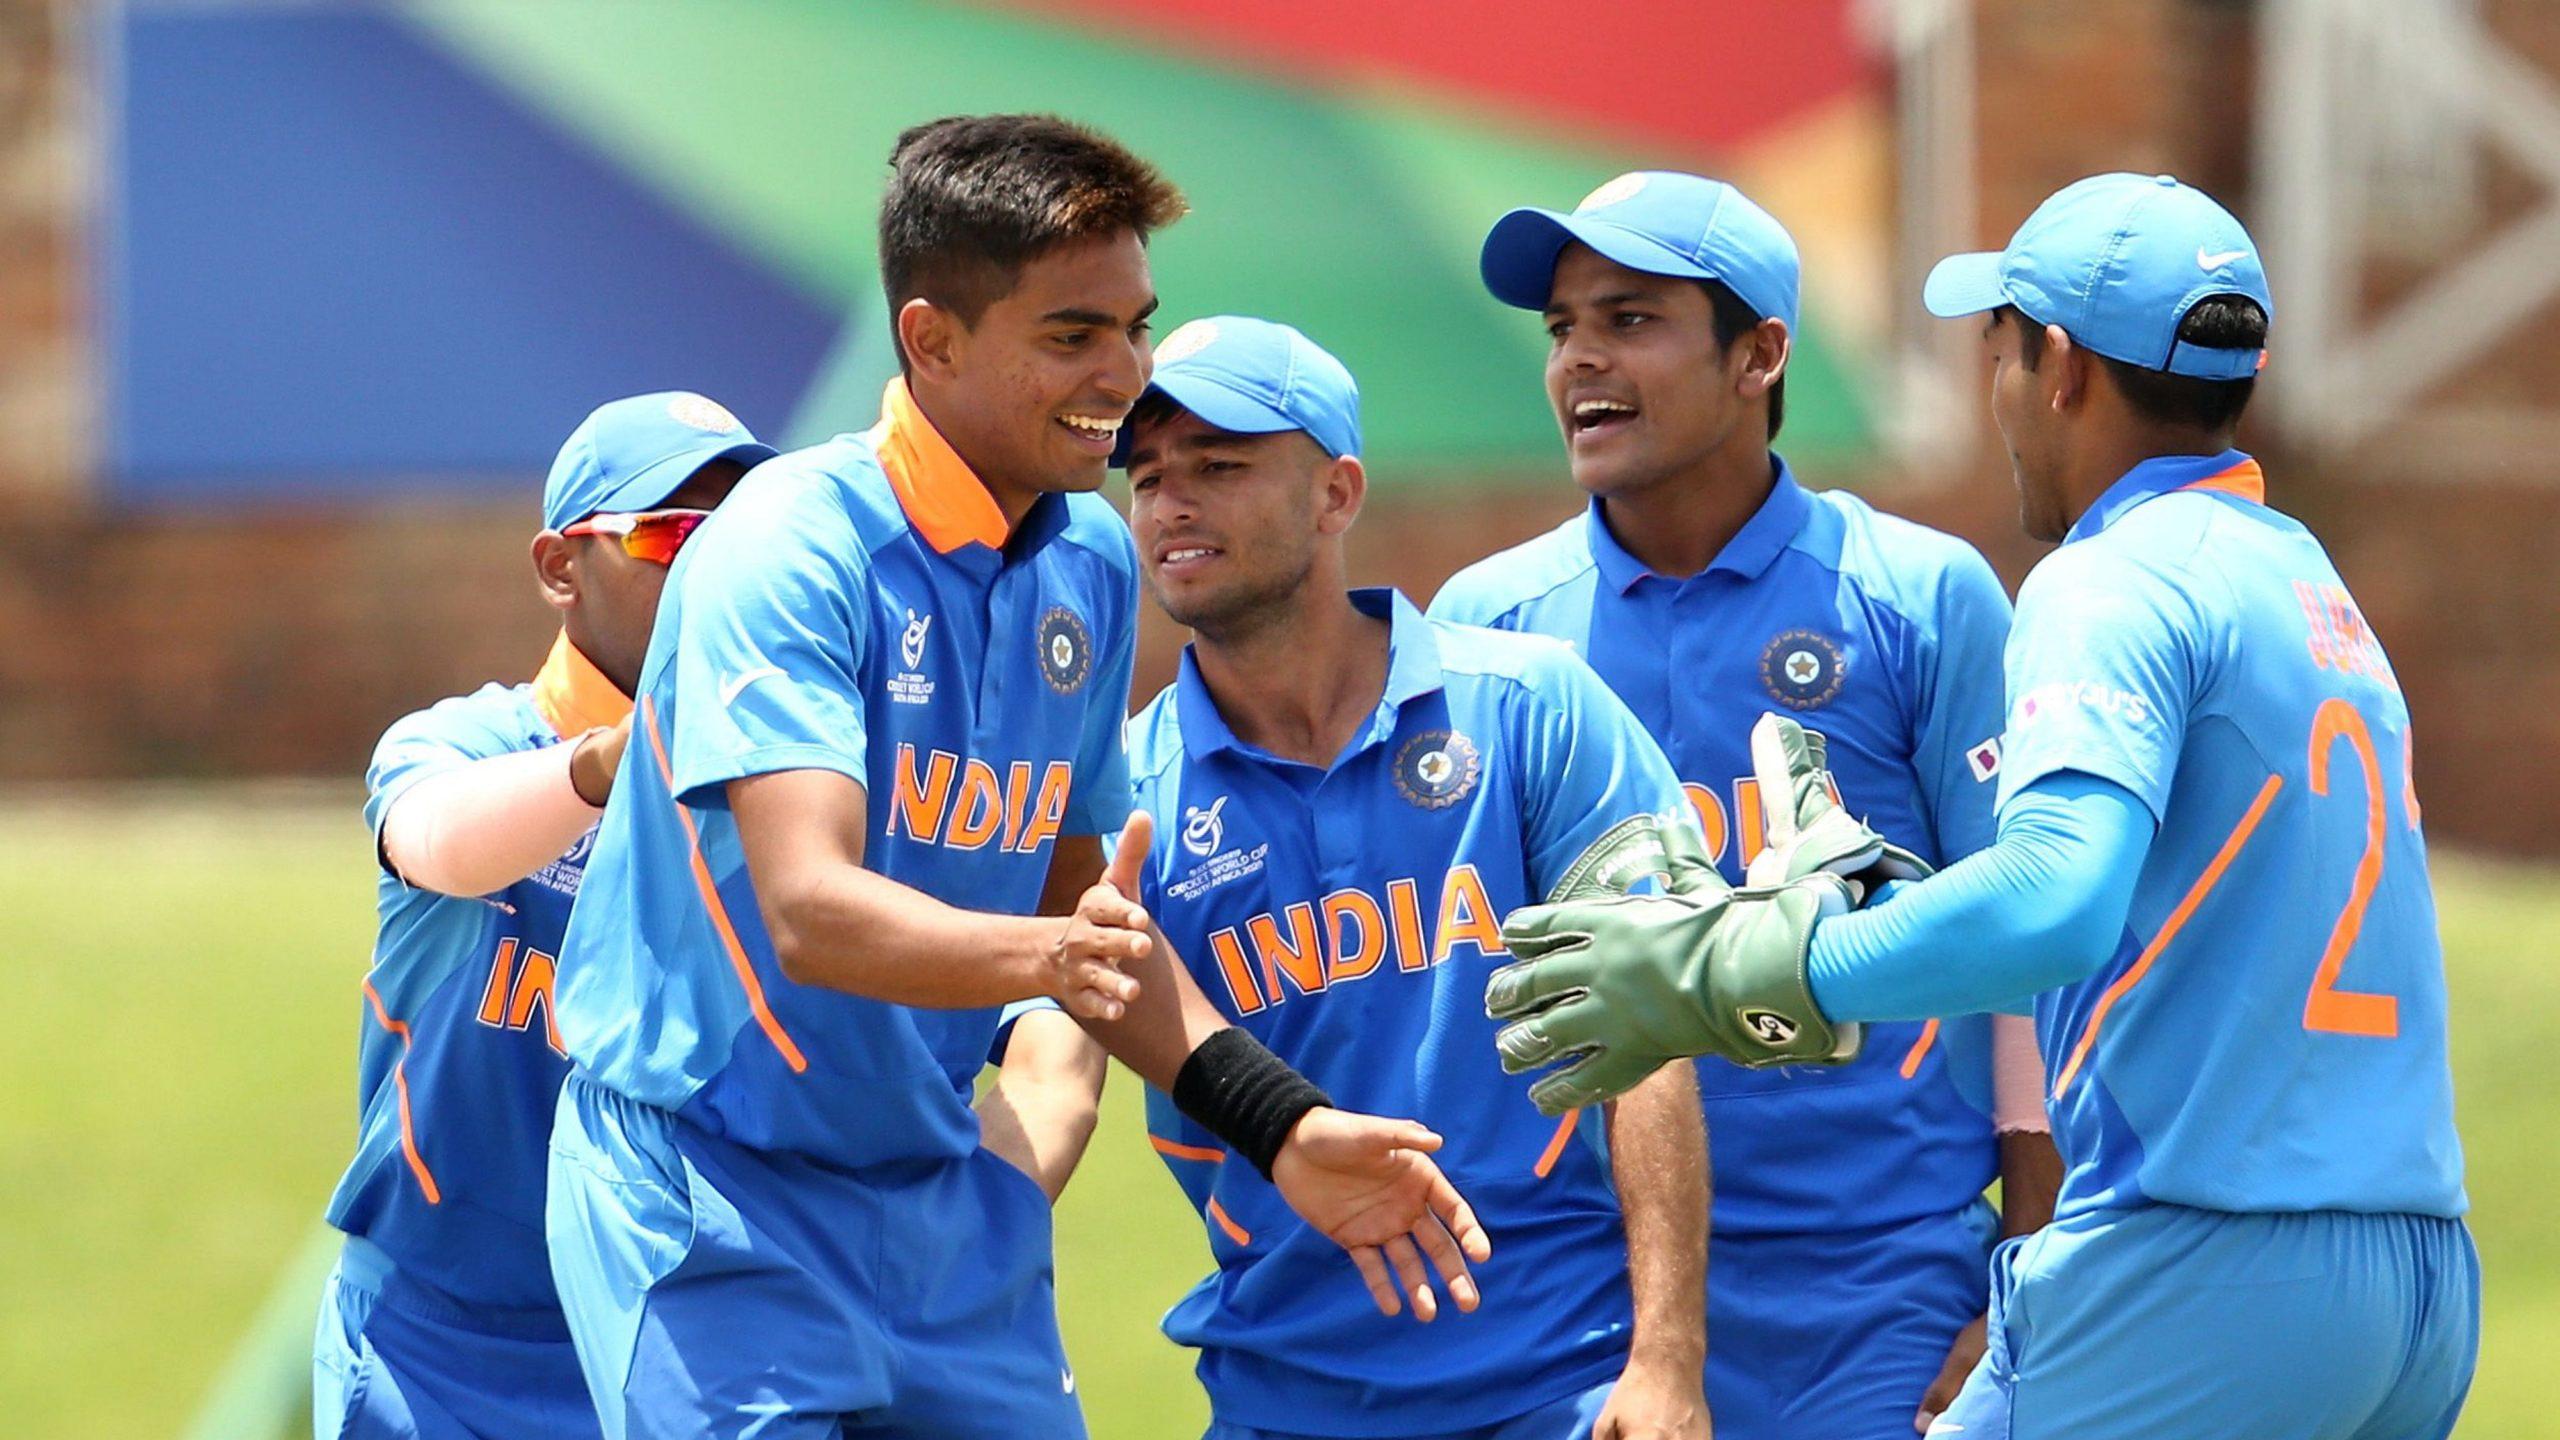 icc u-19 world cup india